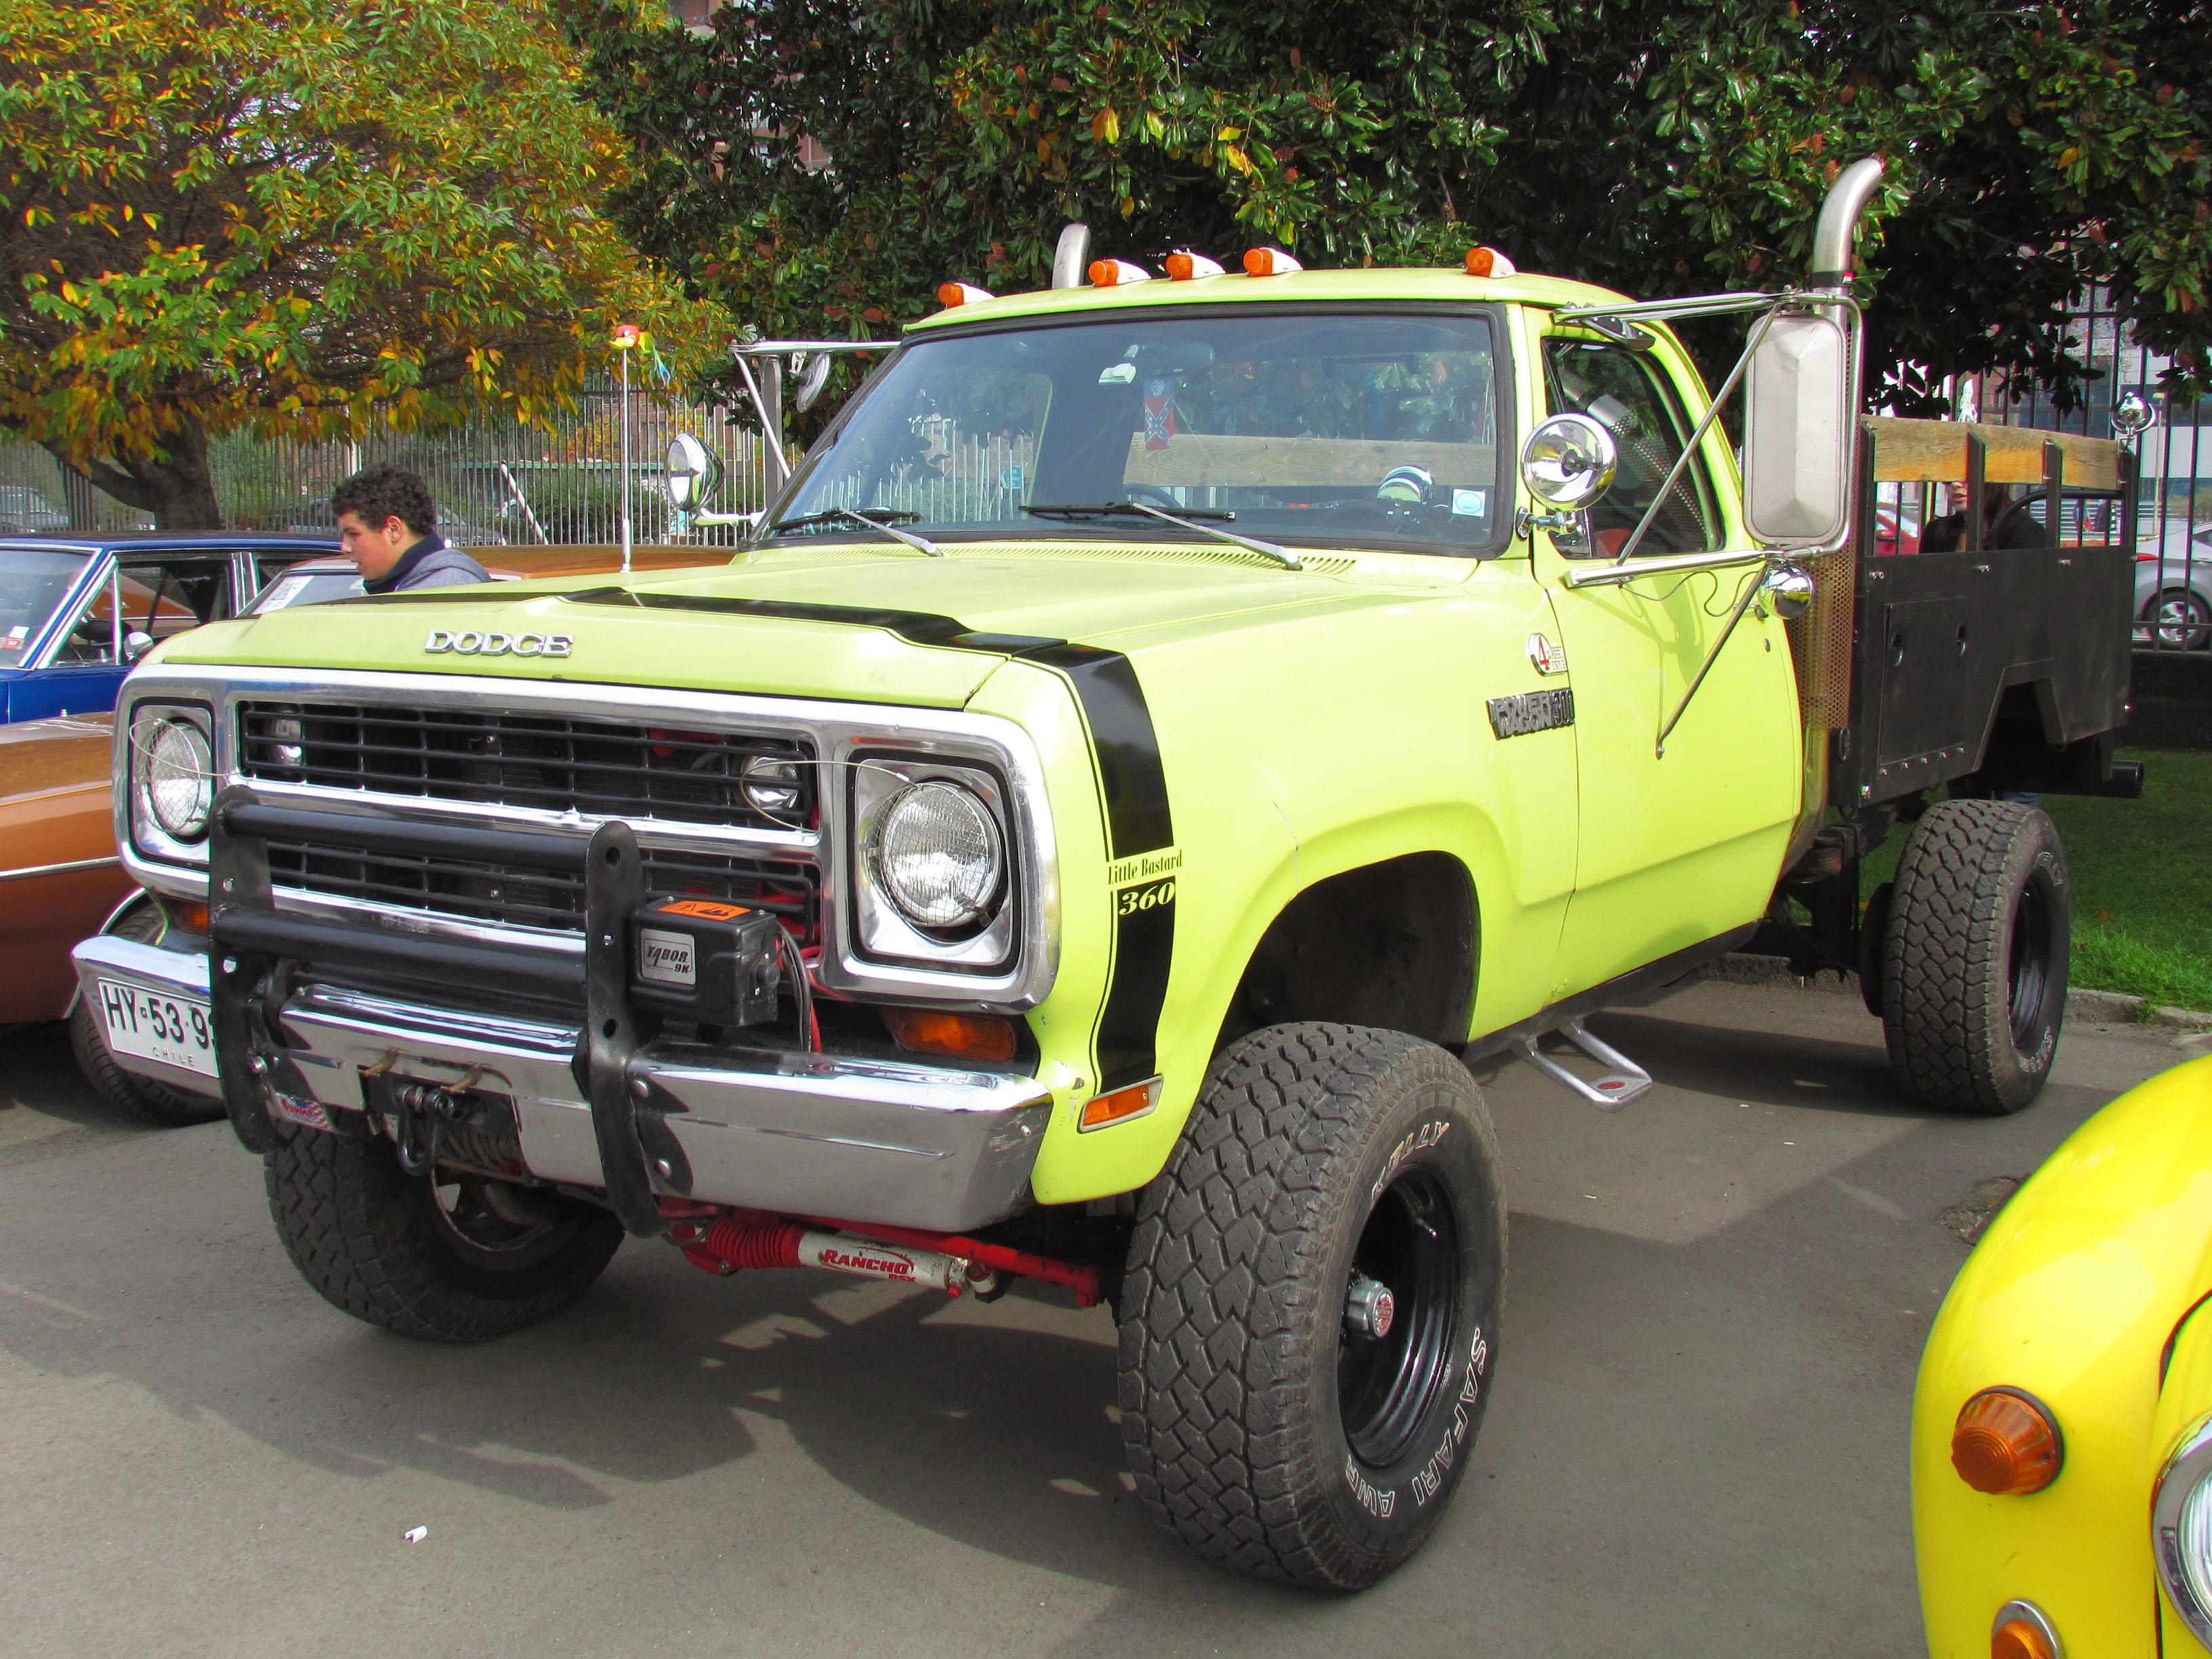 File:Dodge Power Wagon 300 4WD 1980 (8908015028).jpg - Wikimedia ...